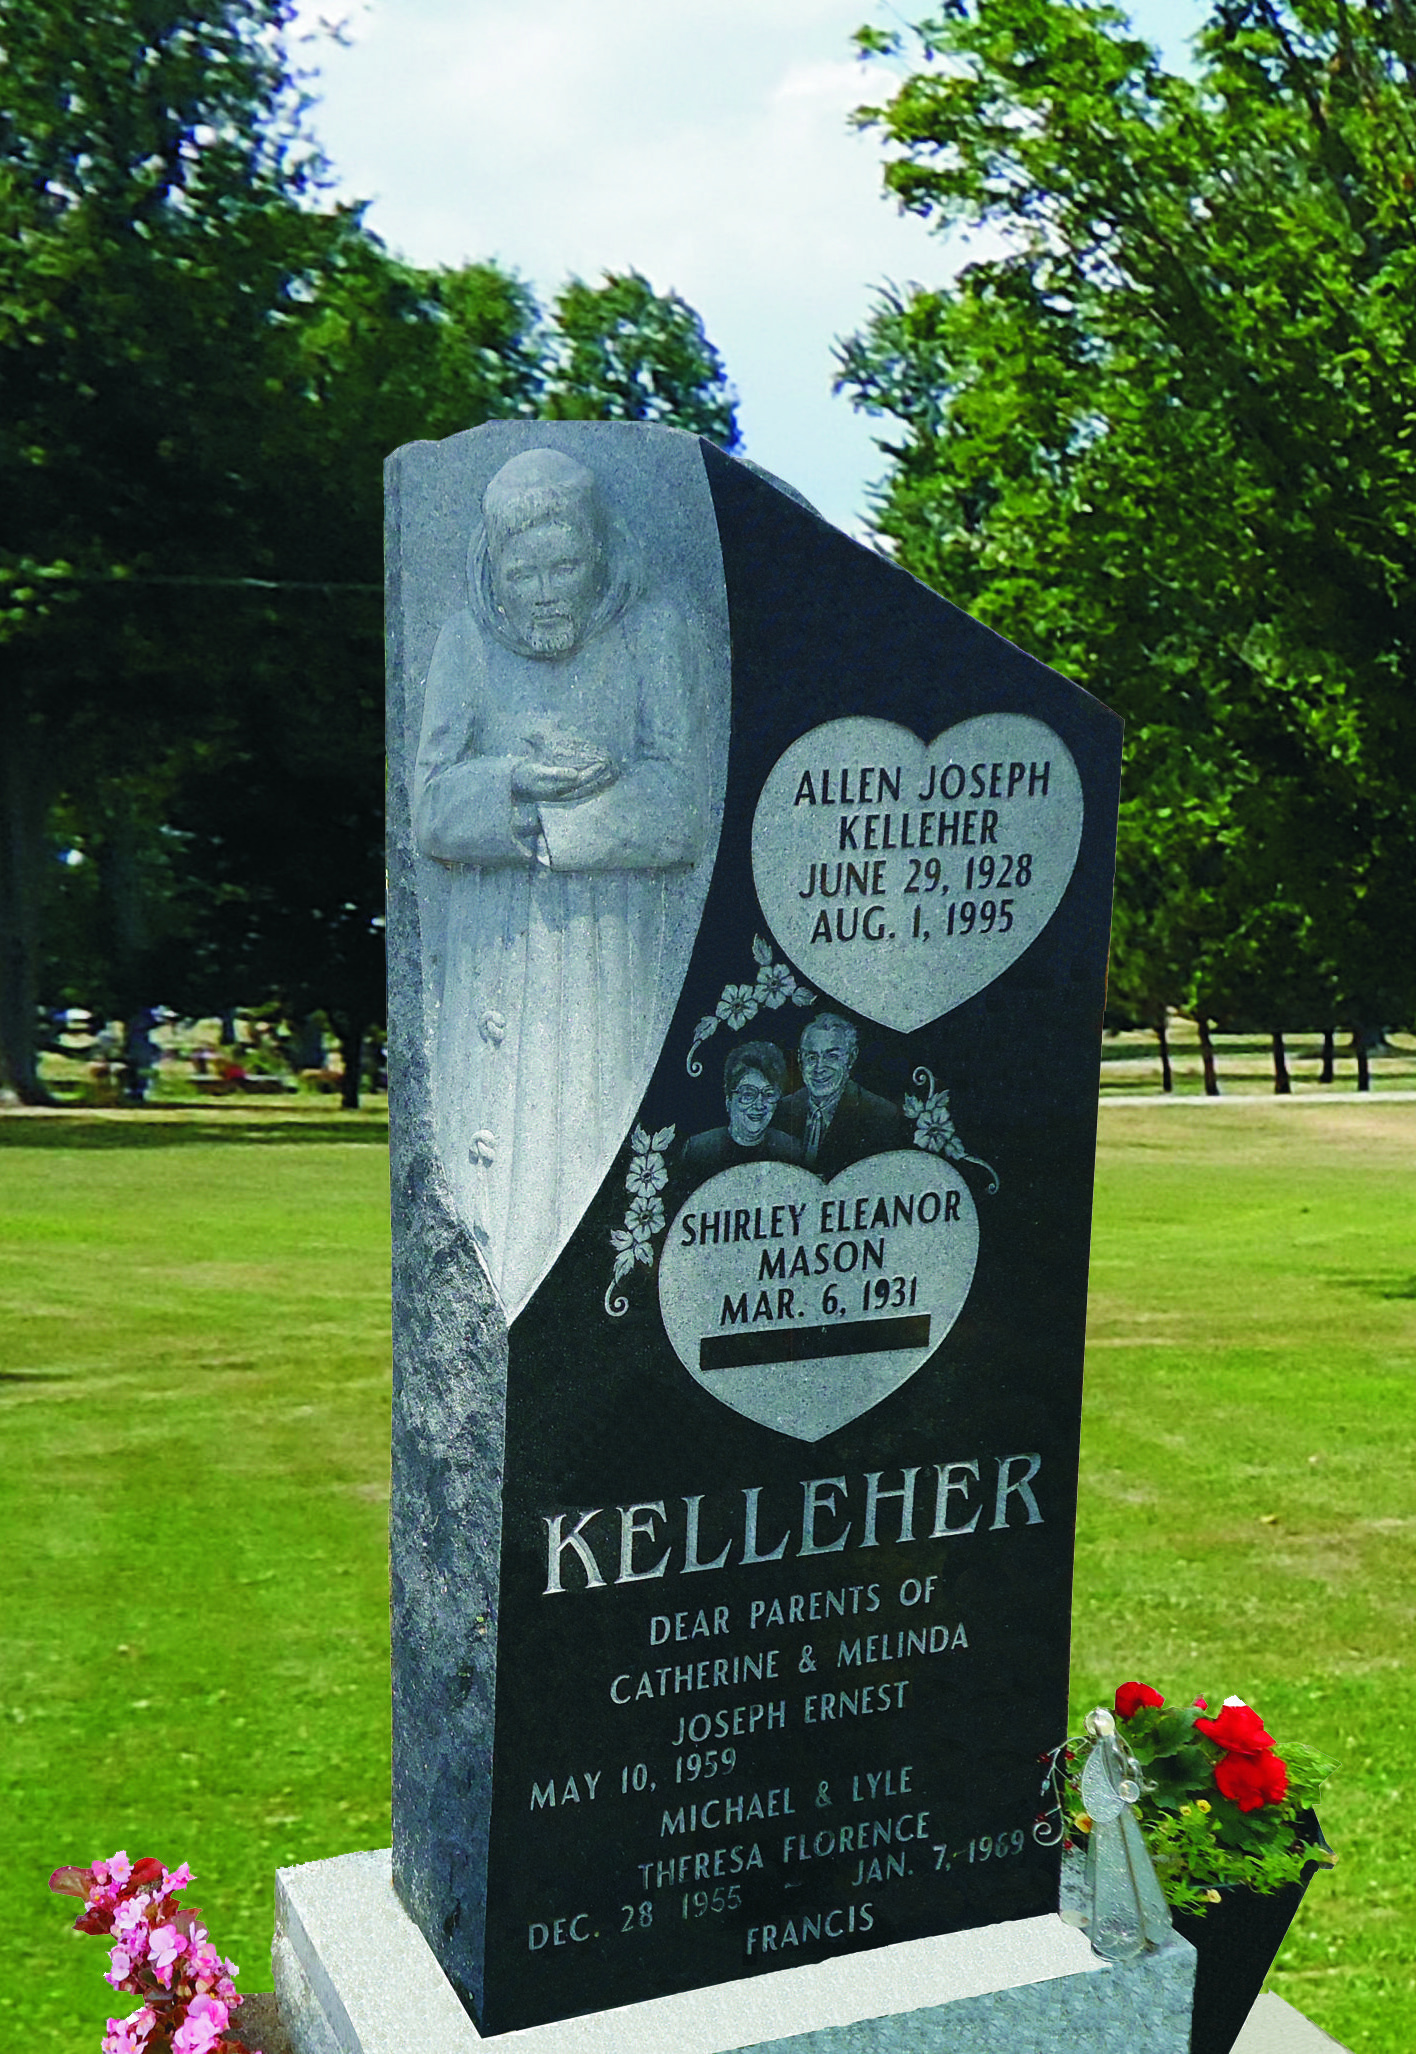 KELLEHER